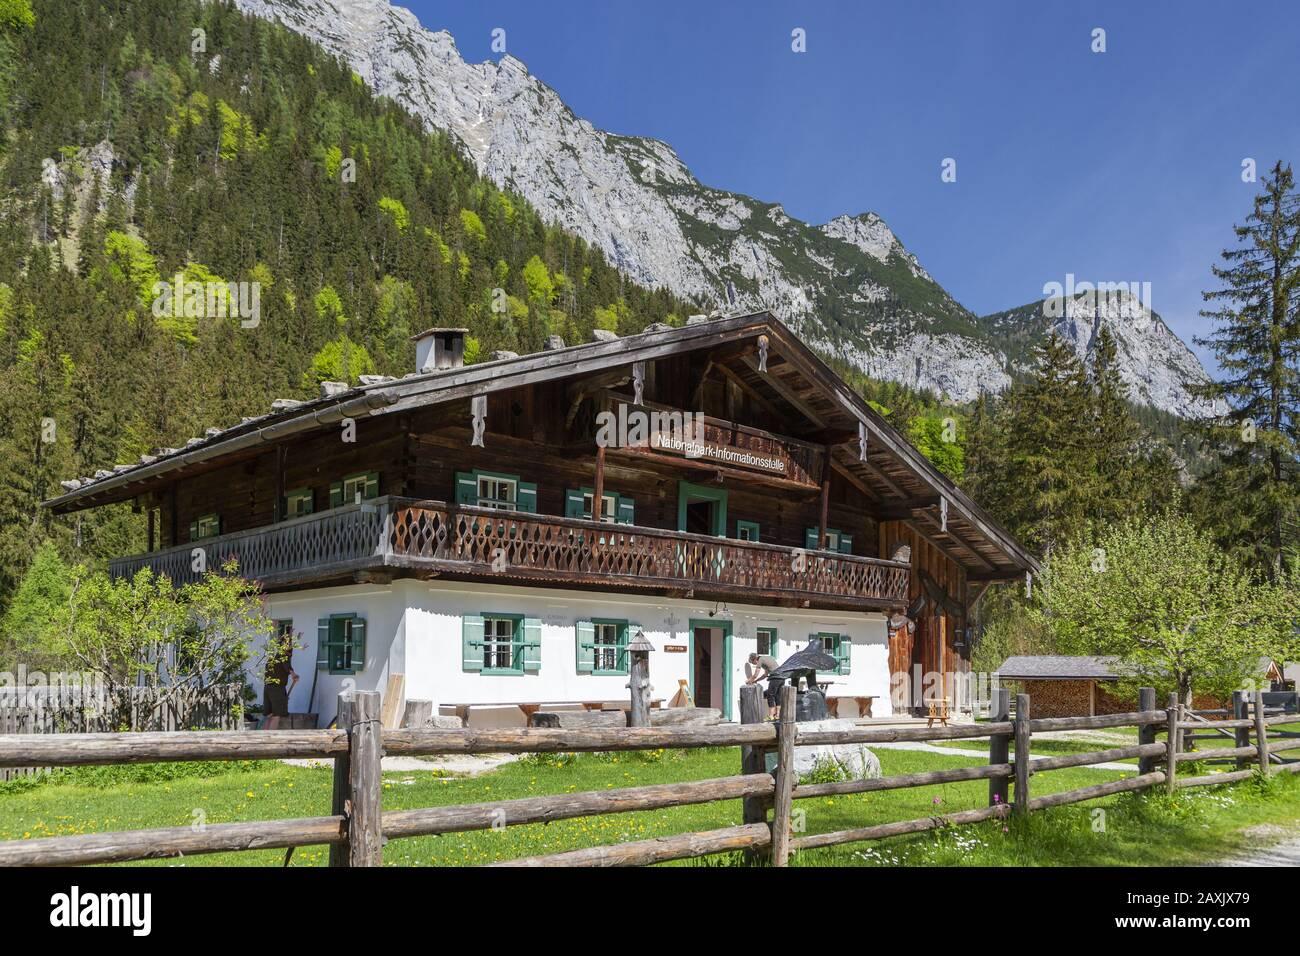 National Park information centre Klausbachhaus, valley Klausbachtal in Hintersee, Ramsau, Berchtesgaden Alps, Berchtesgadener Land, Upper Bavaria, Bav Stock Photo